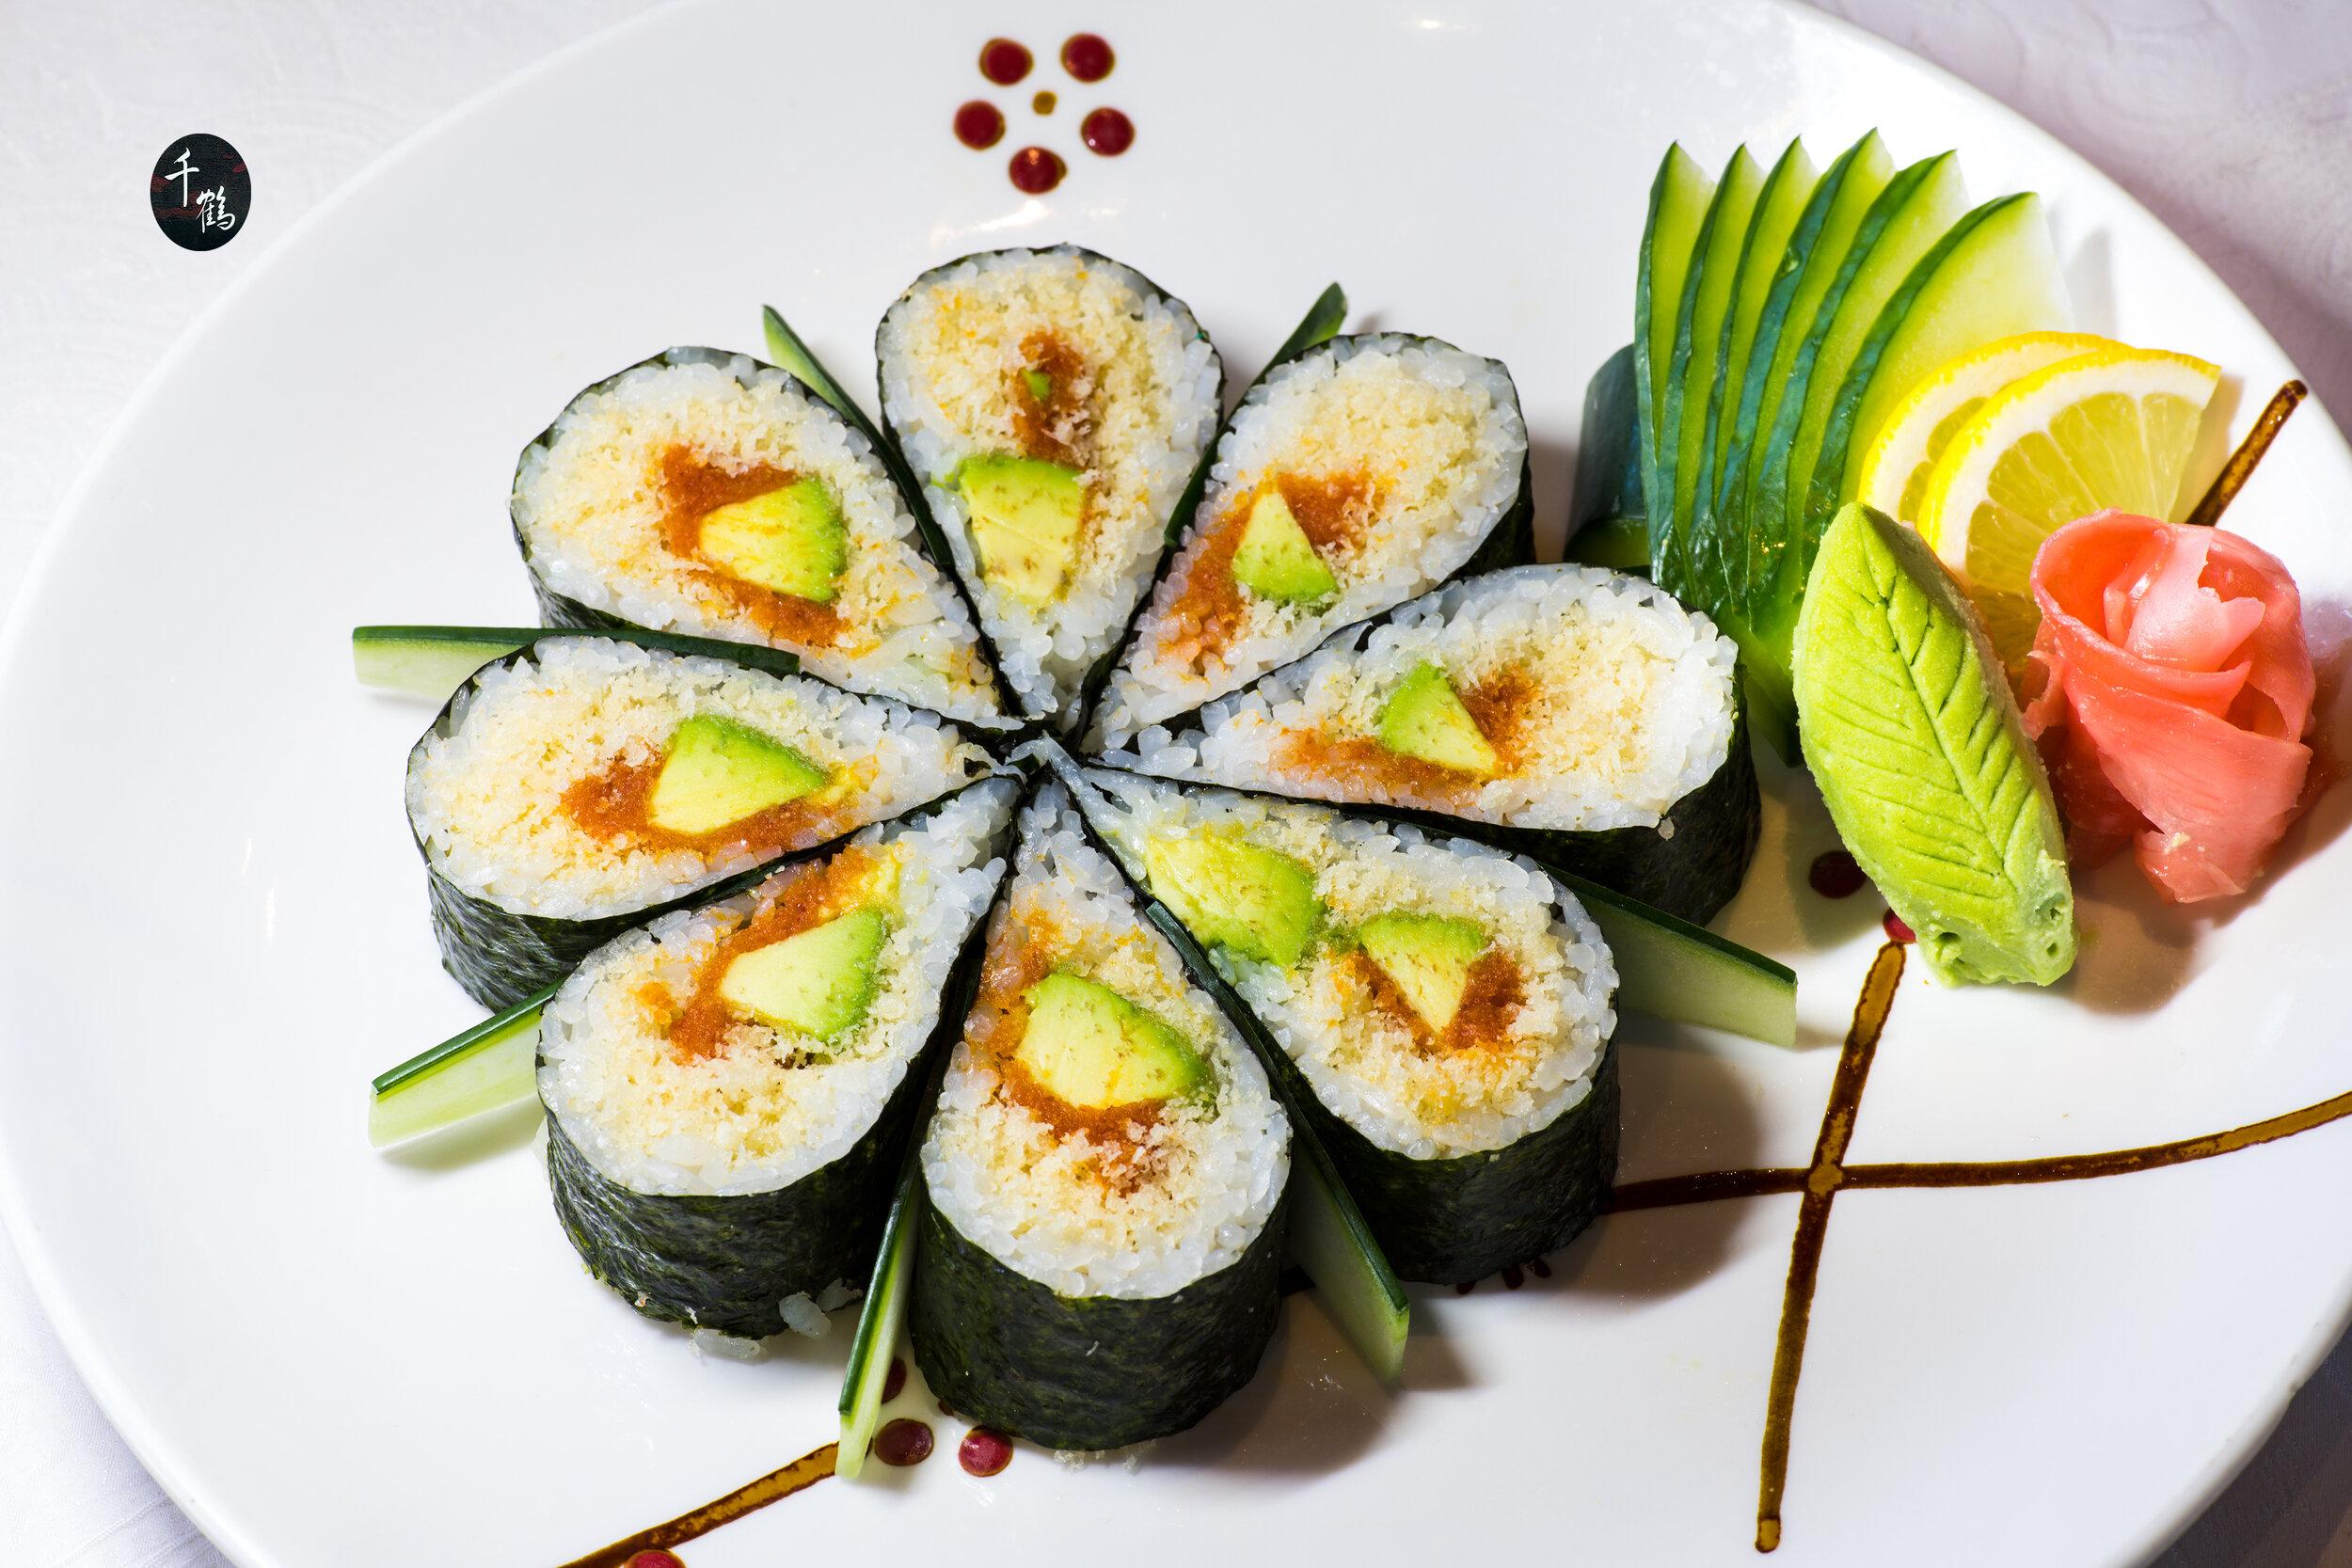 Kamikaze Roll (8) $9.00